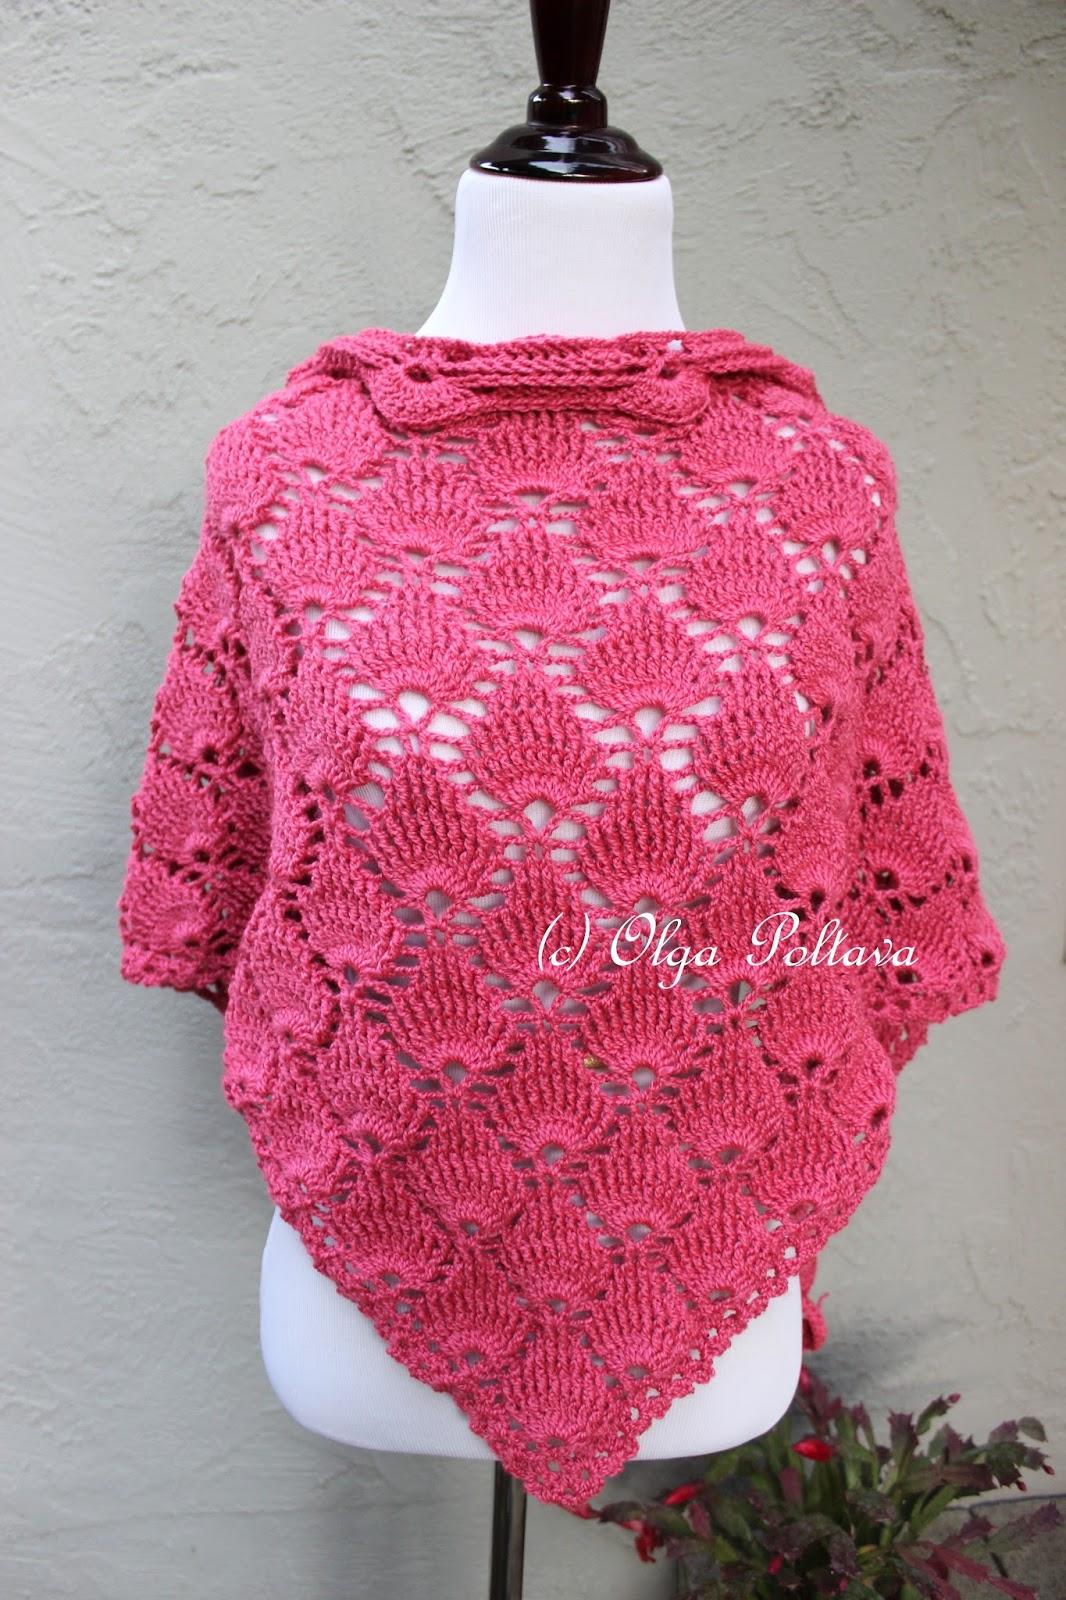 Lacy Crochet Bright Pink Shells Crochet Scarf